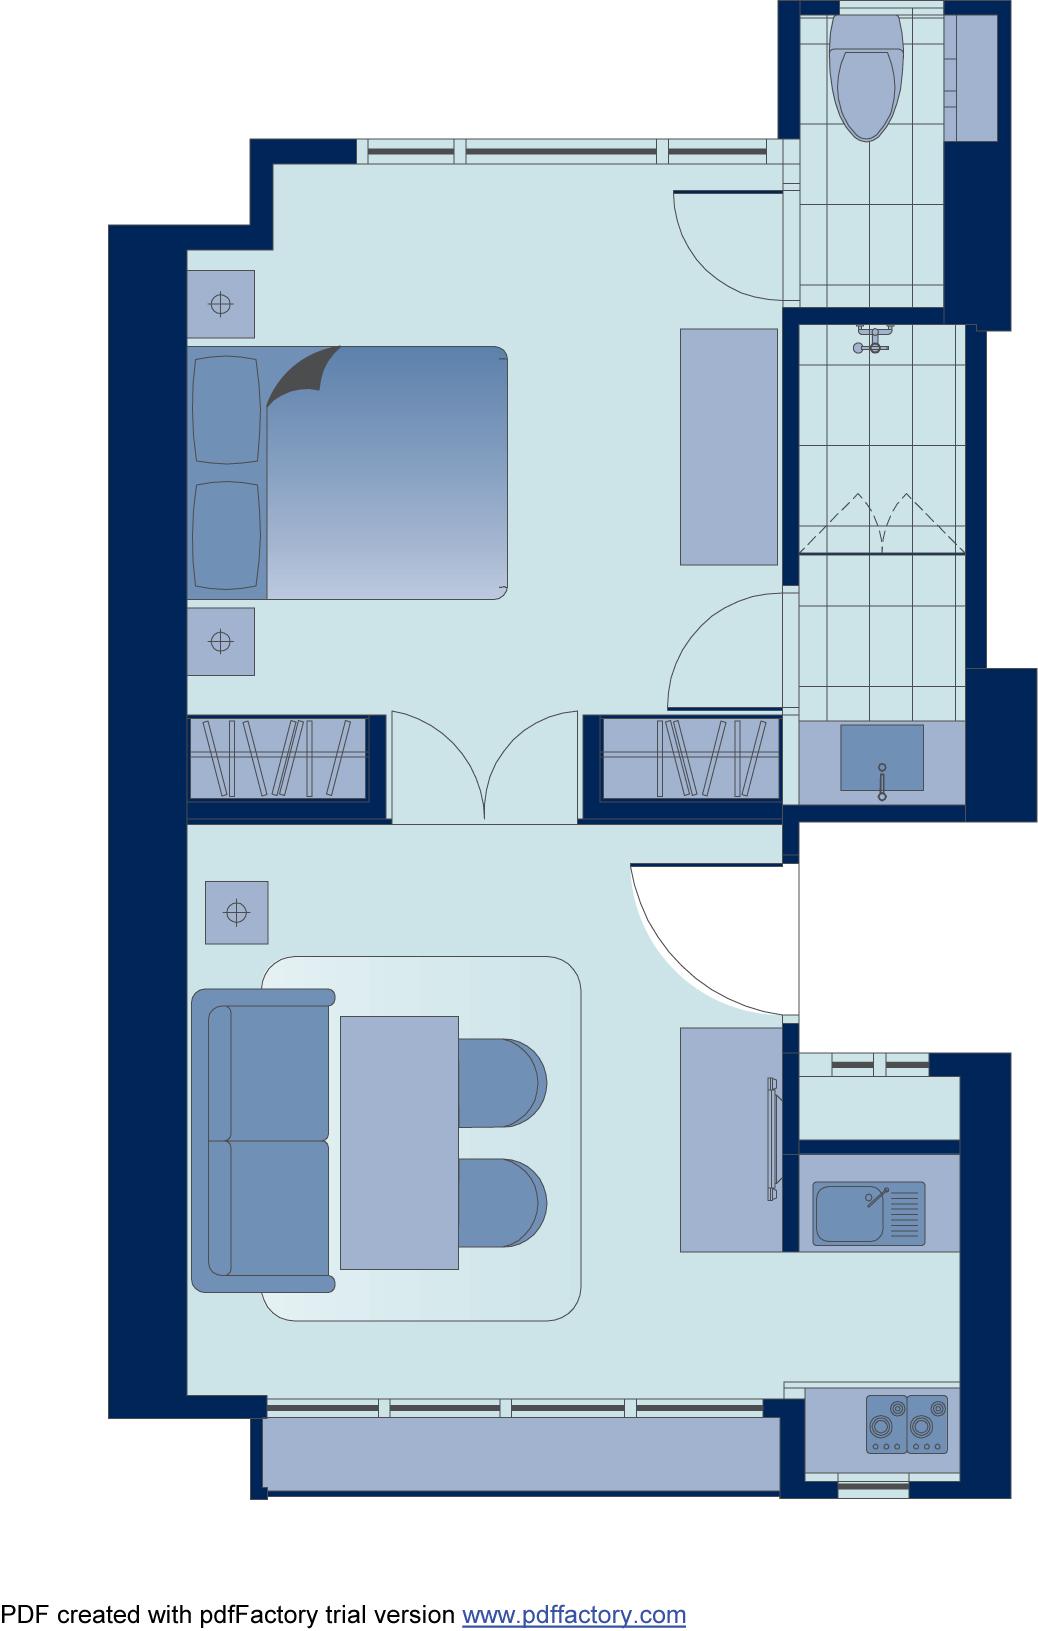 Floor plan 3 at Peel Street Central Apartments